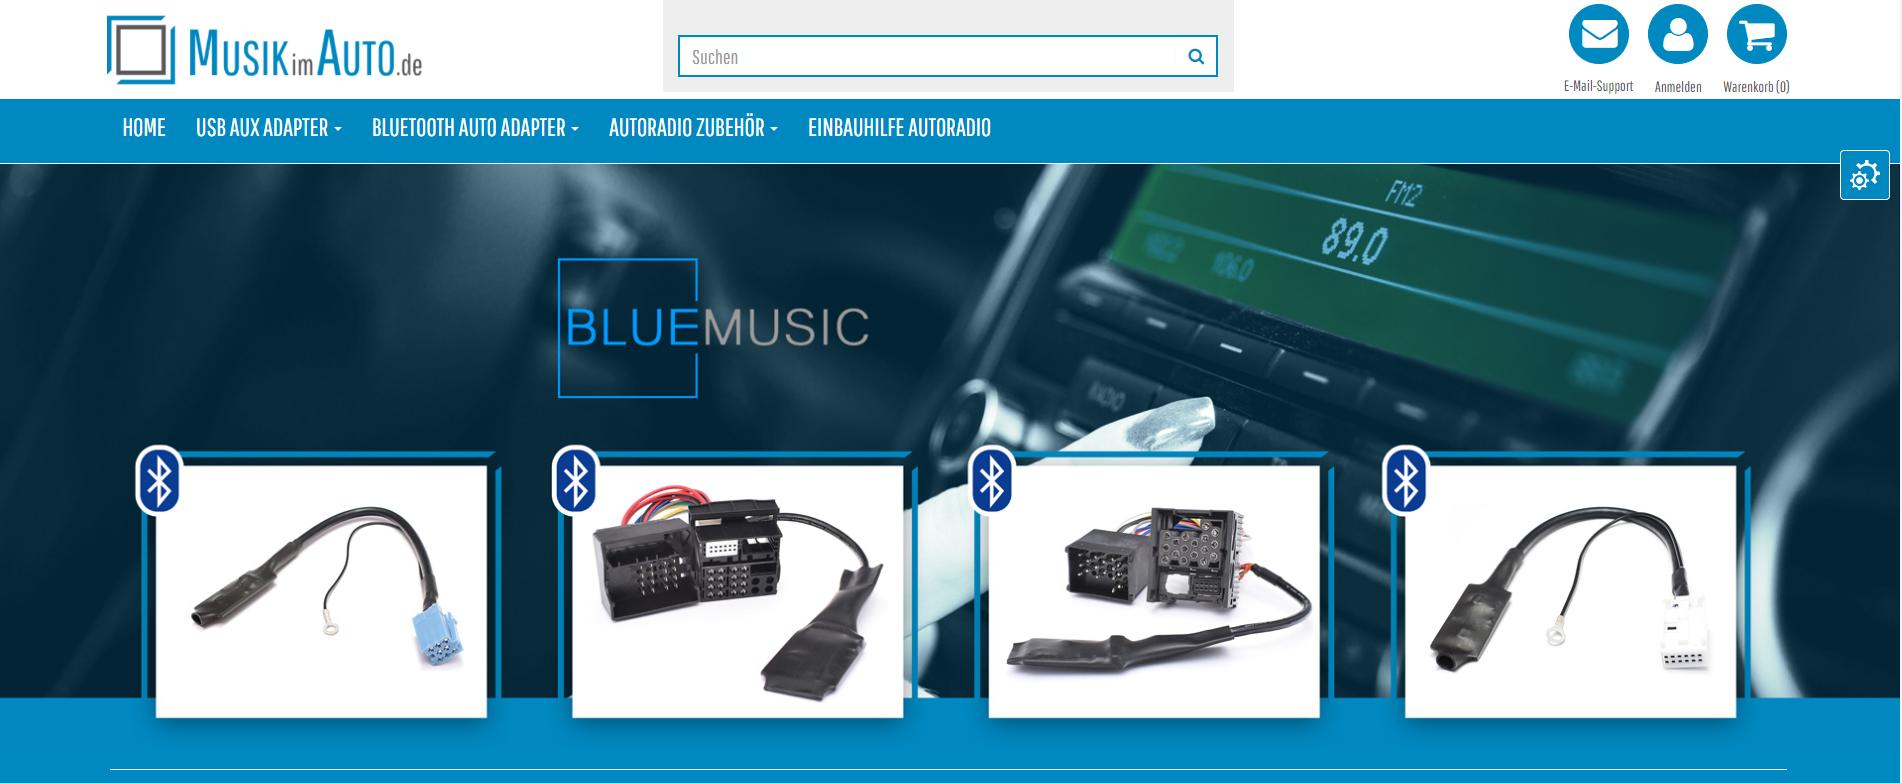 MusikimAuto-JTL-Shop-Startseite